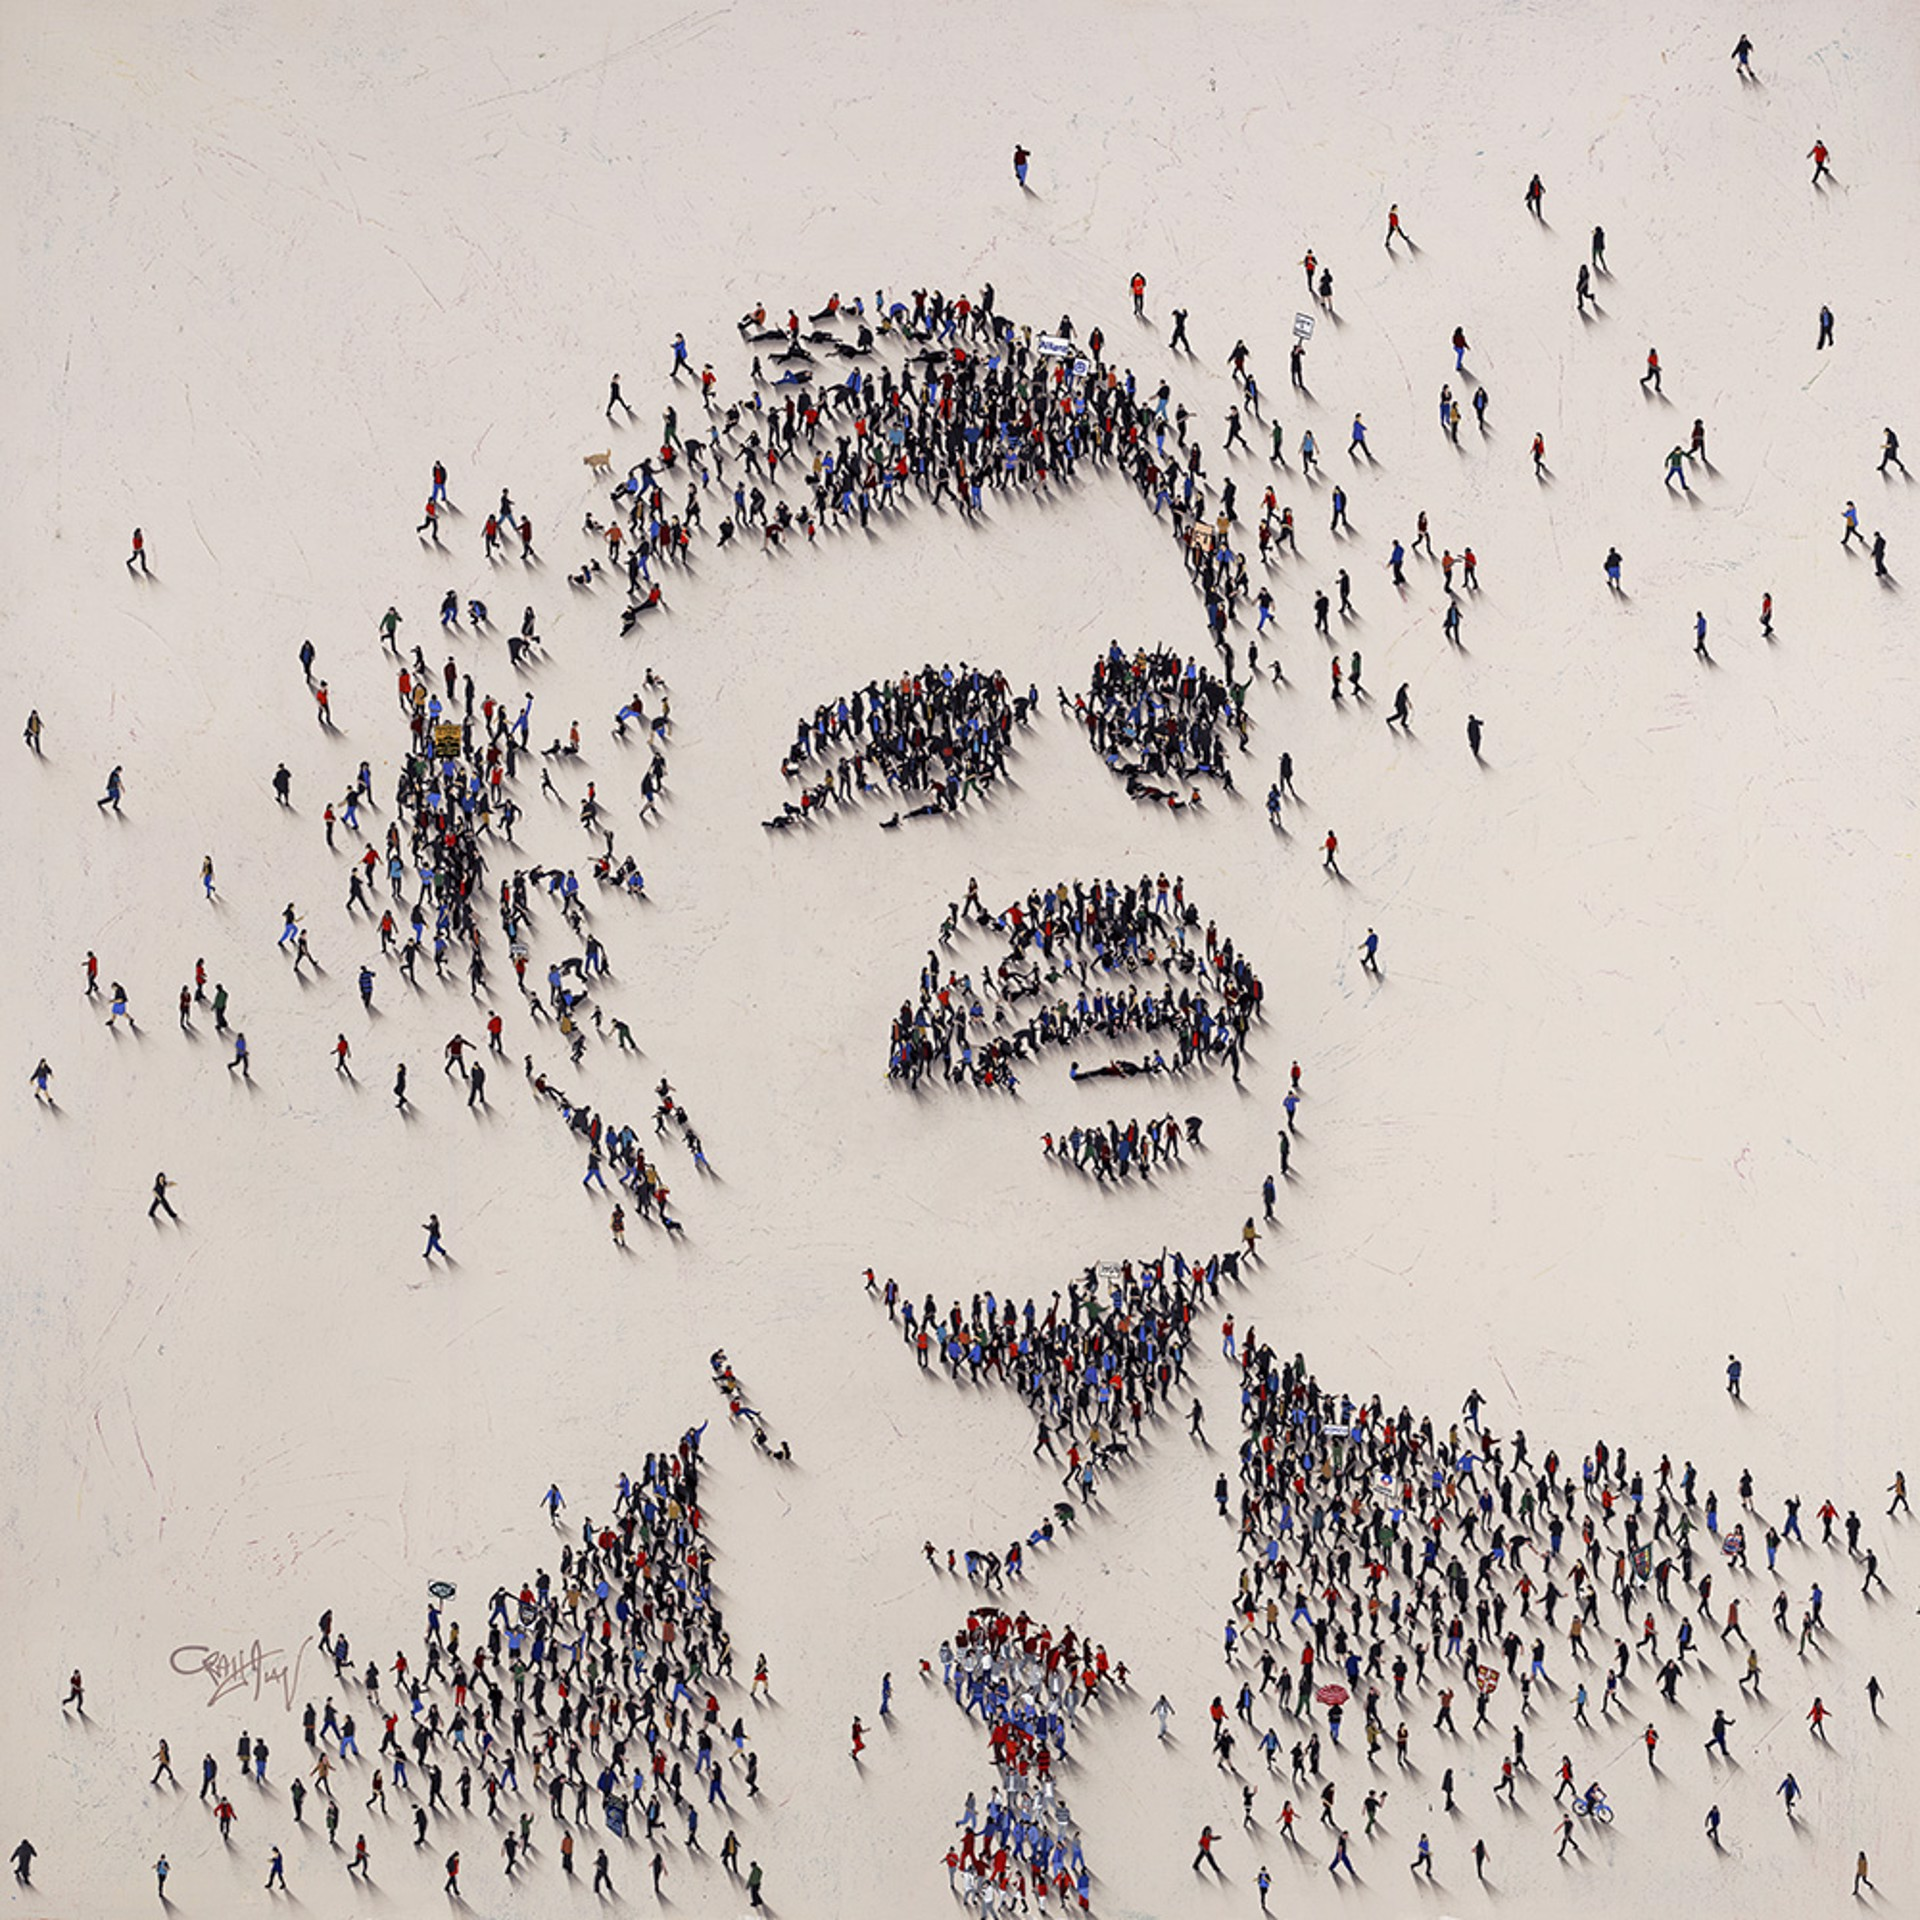 Mohamed A. El-Erian (SOLD) by Craig Alan, Populus Commission